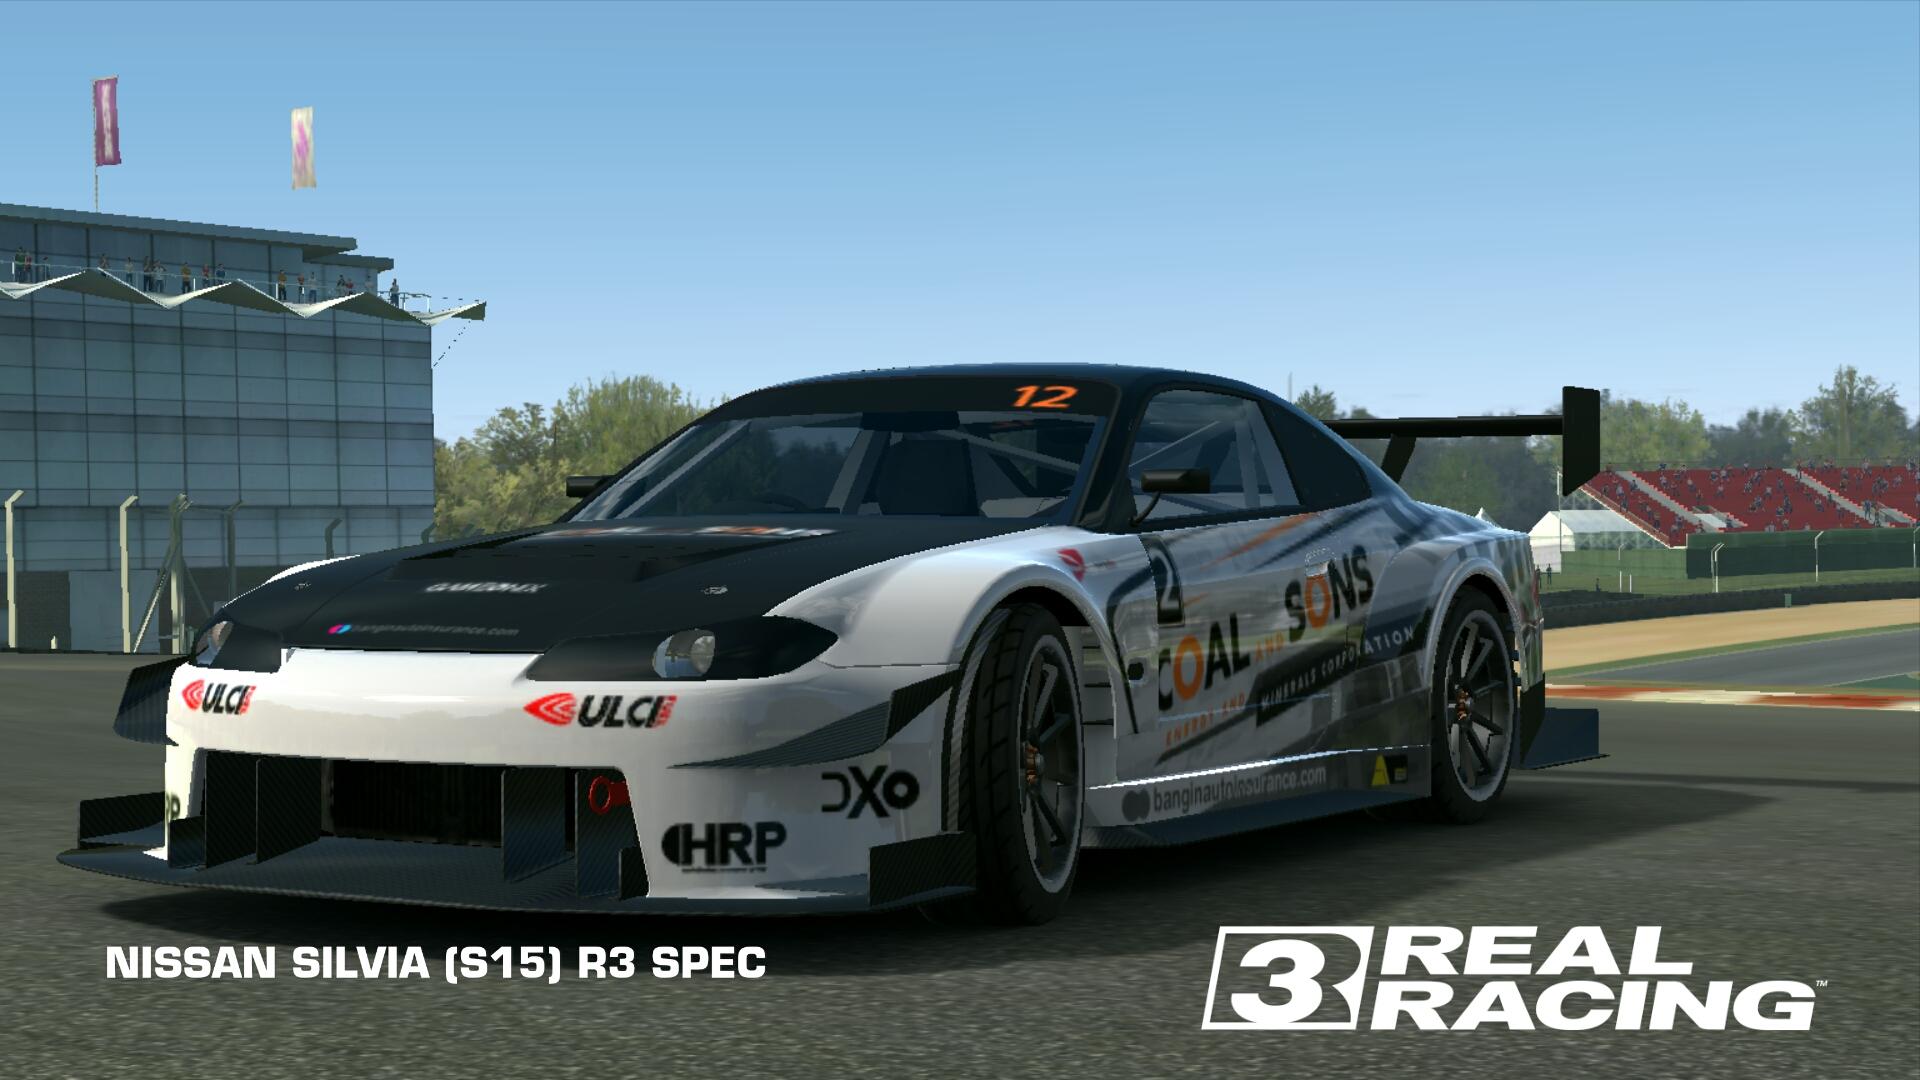 Silvia s15 r3 spec